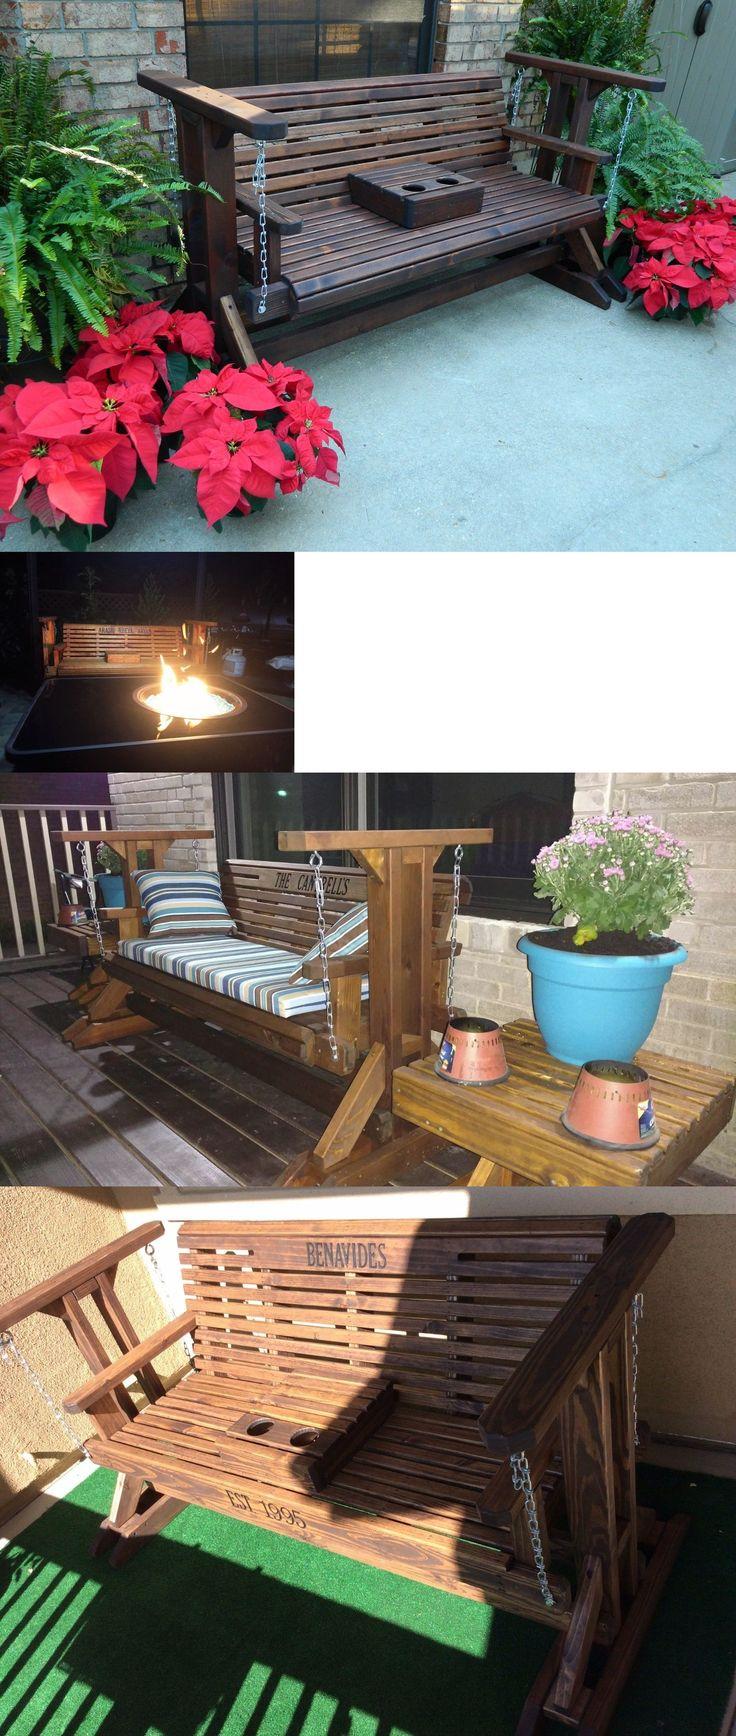 Swings 79700: Handmade Heavy Duty Cedar Porch Glider Patio Glider Bench Glider Patio Furniture -> BUY IT NOW ONLY: $679.99 on eBay!